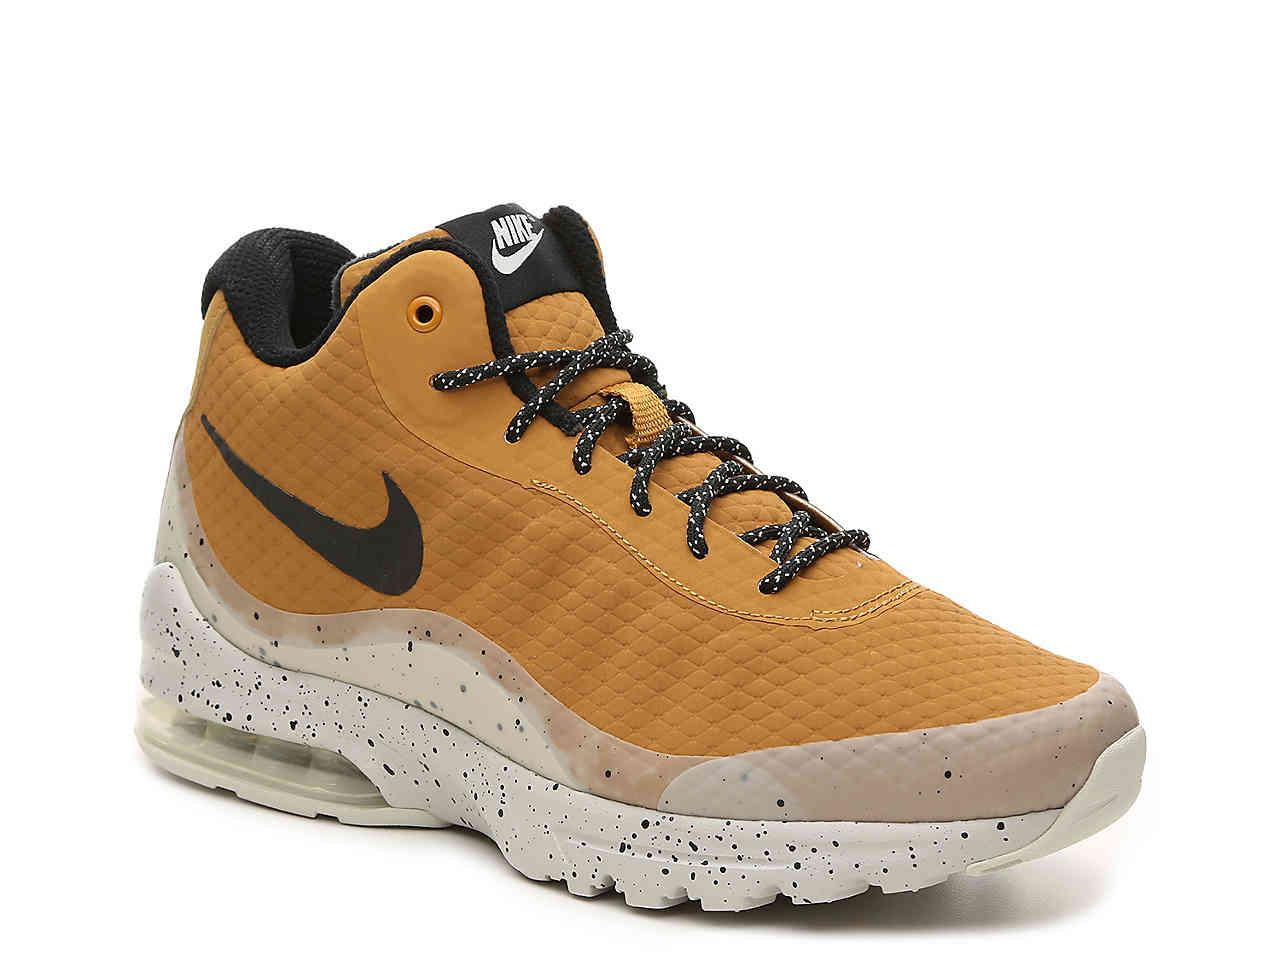 size 40 d9675 0b277 Lyst - Nike Air Max Invigor Mid-top Sneaker in Brown for Men